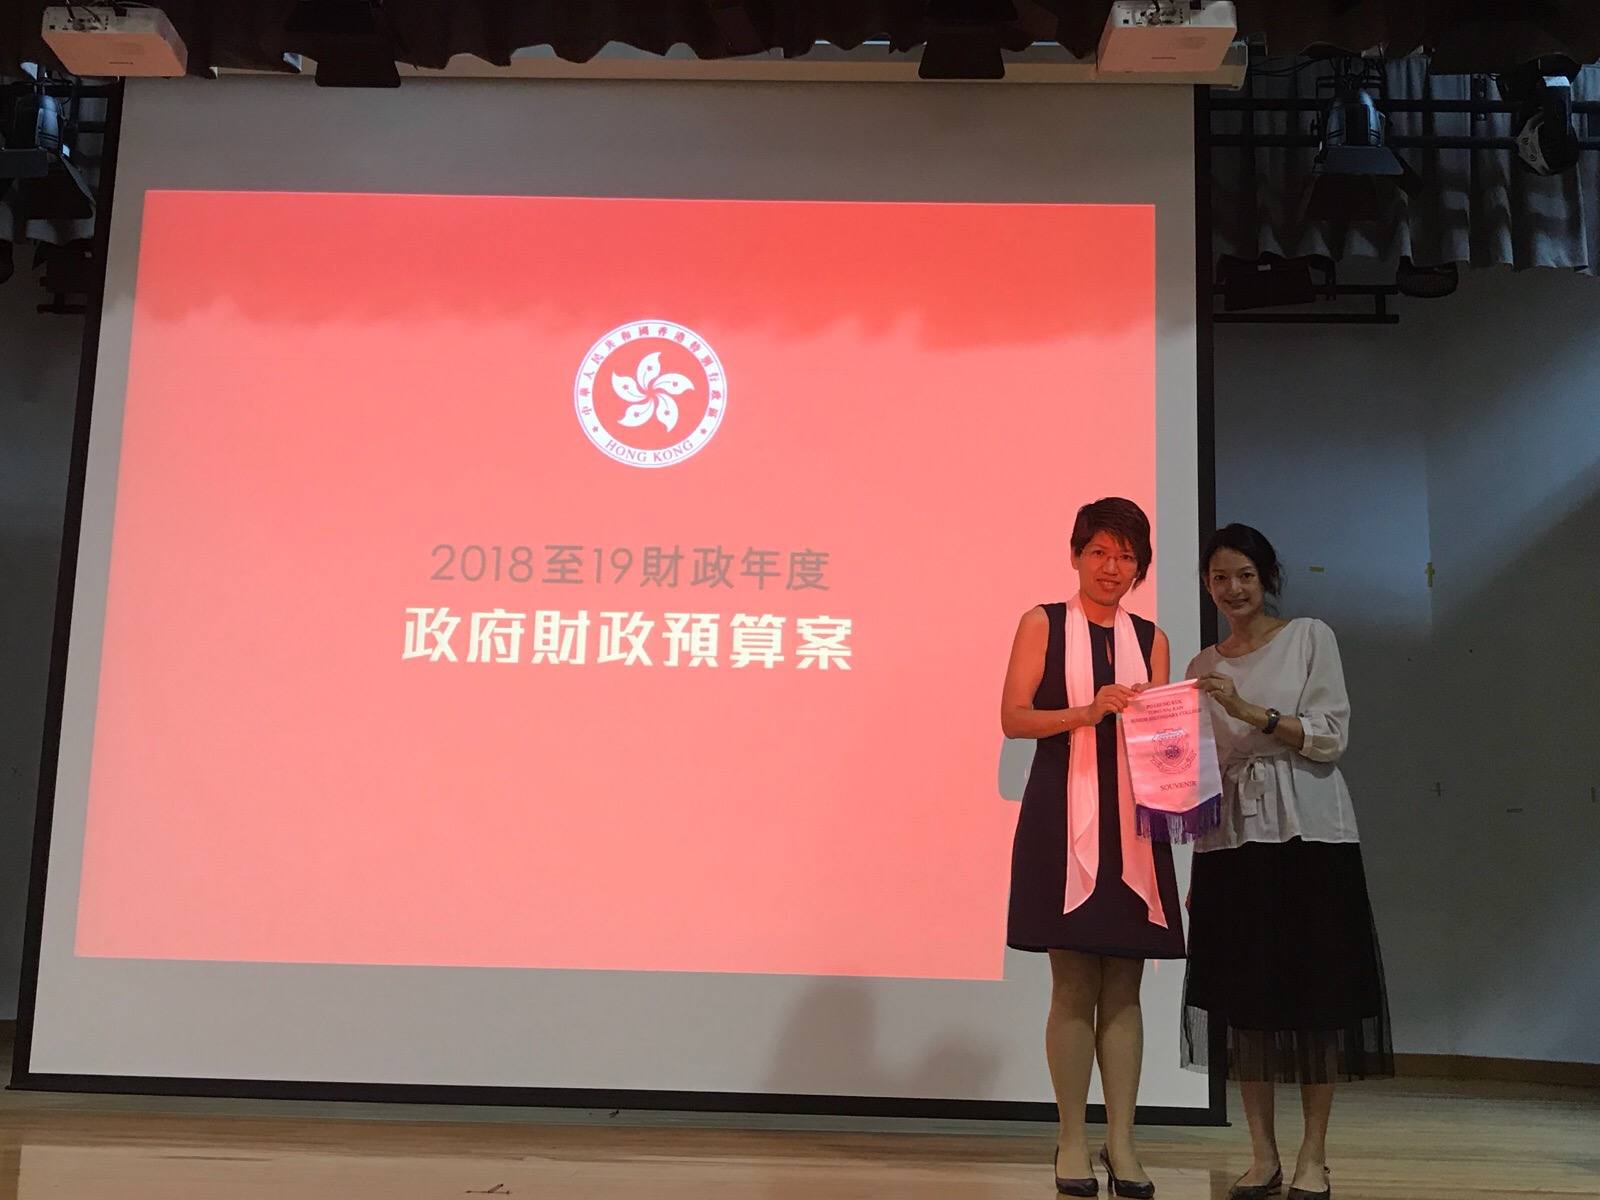 Ms. Siu, our vice-principal, presents a souvenir to Ms. Ho.